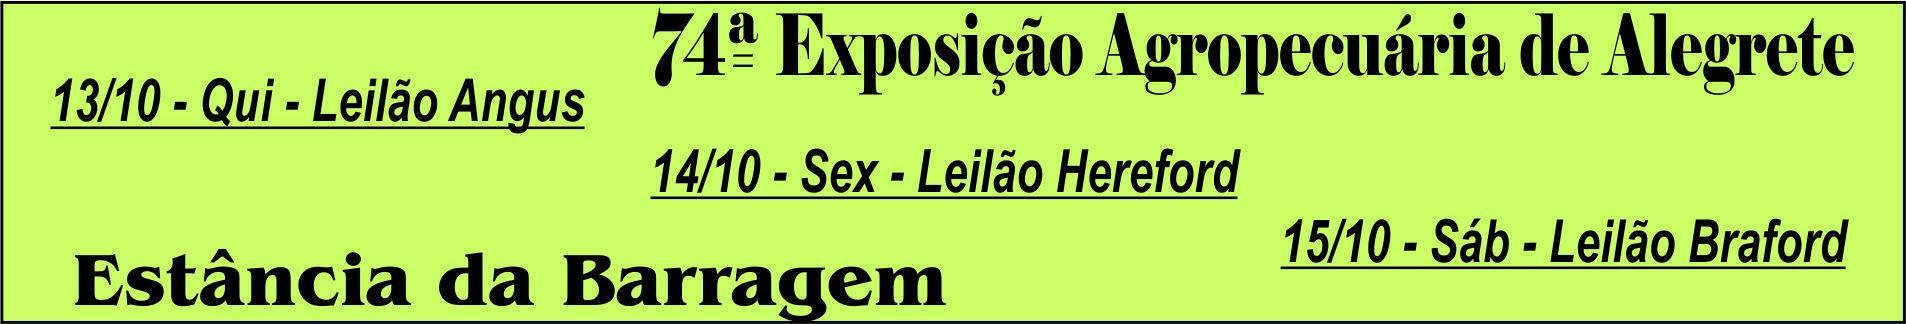 Leil�es Alegrete